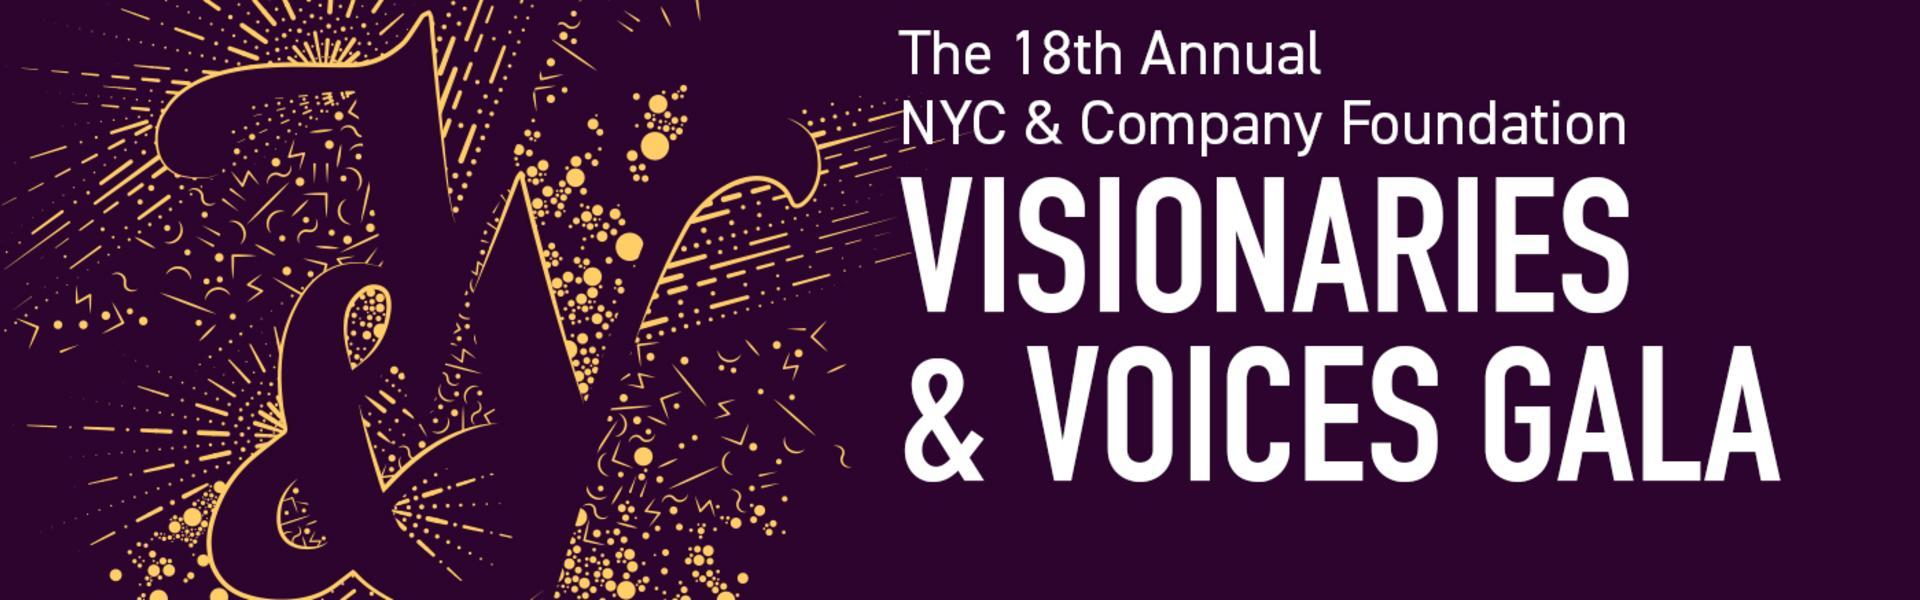 Visionaries & Voices Gala Header